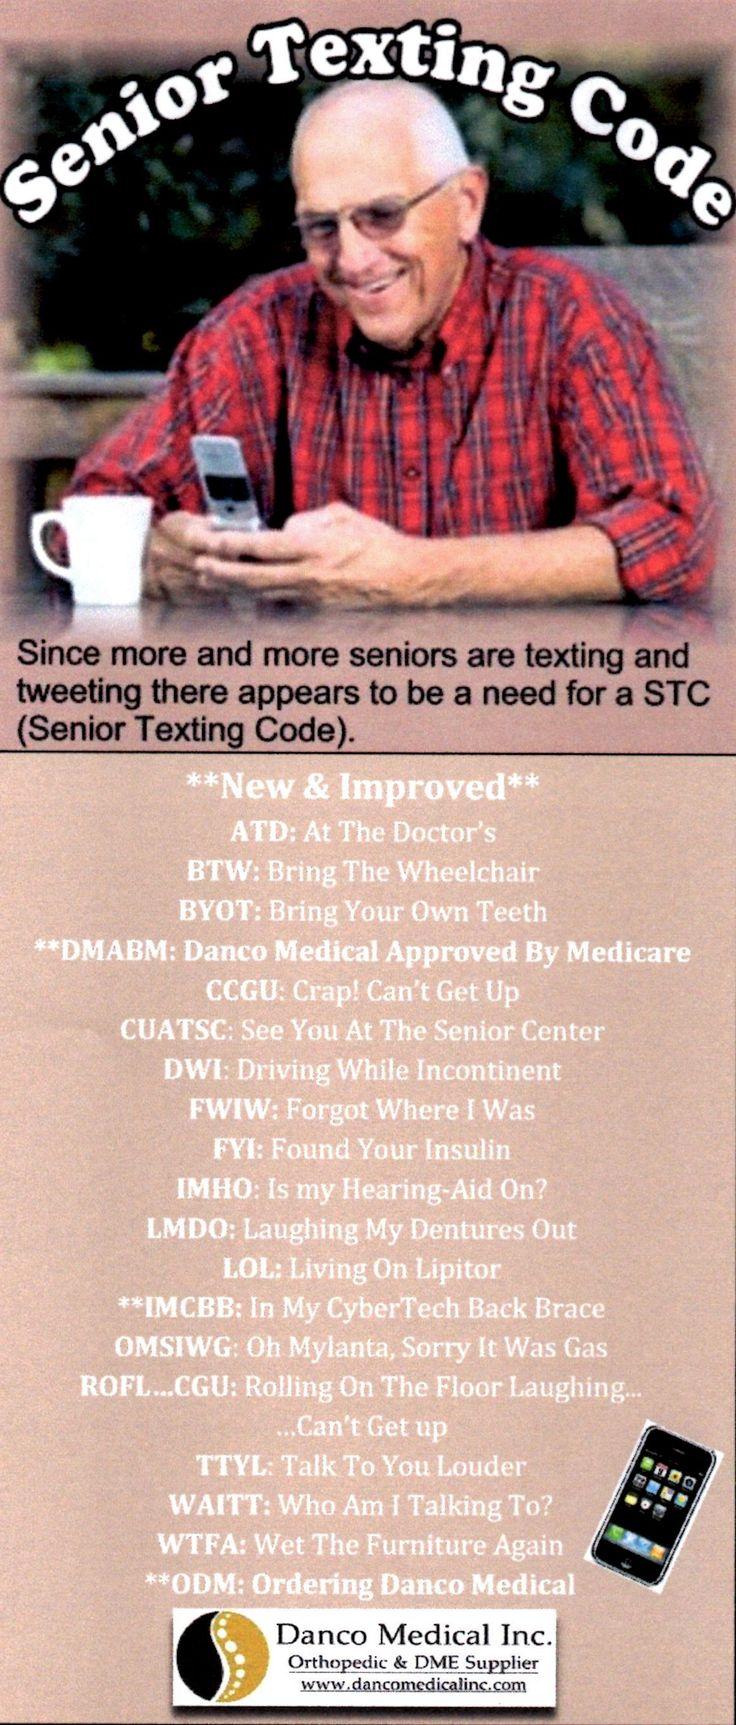 #SeniorTexting #DancoStyle www.dancomedicalinc.com